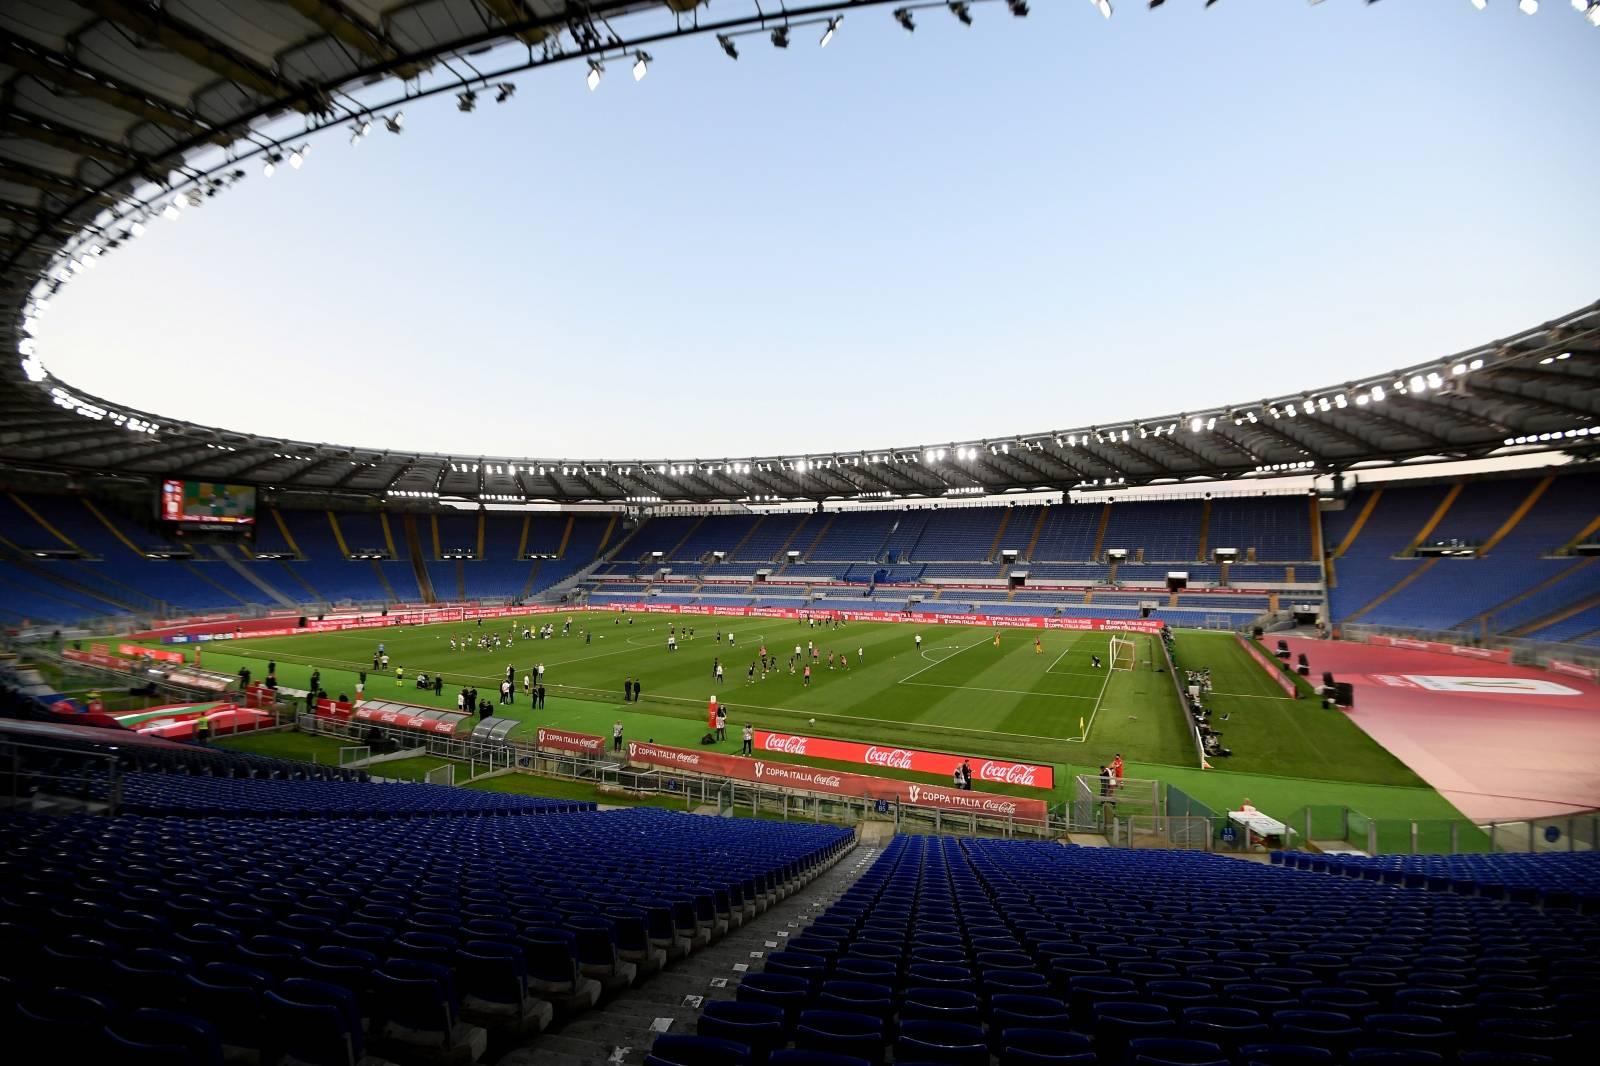 FILE PHOTO: Coppa Italia - Final - Napoli v Juventus